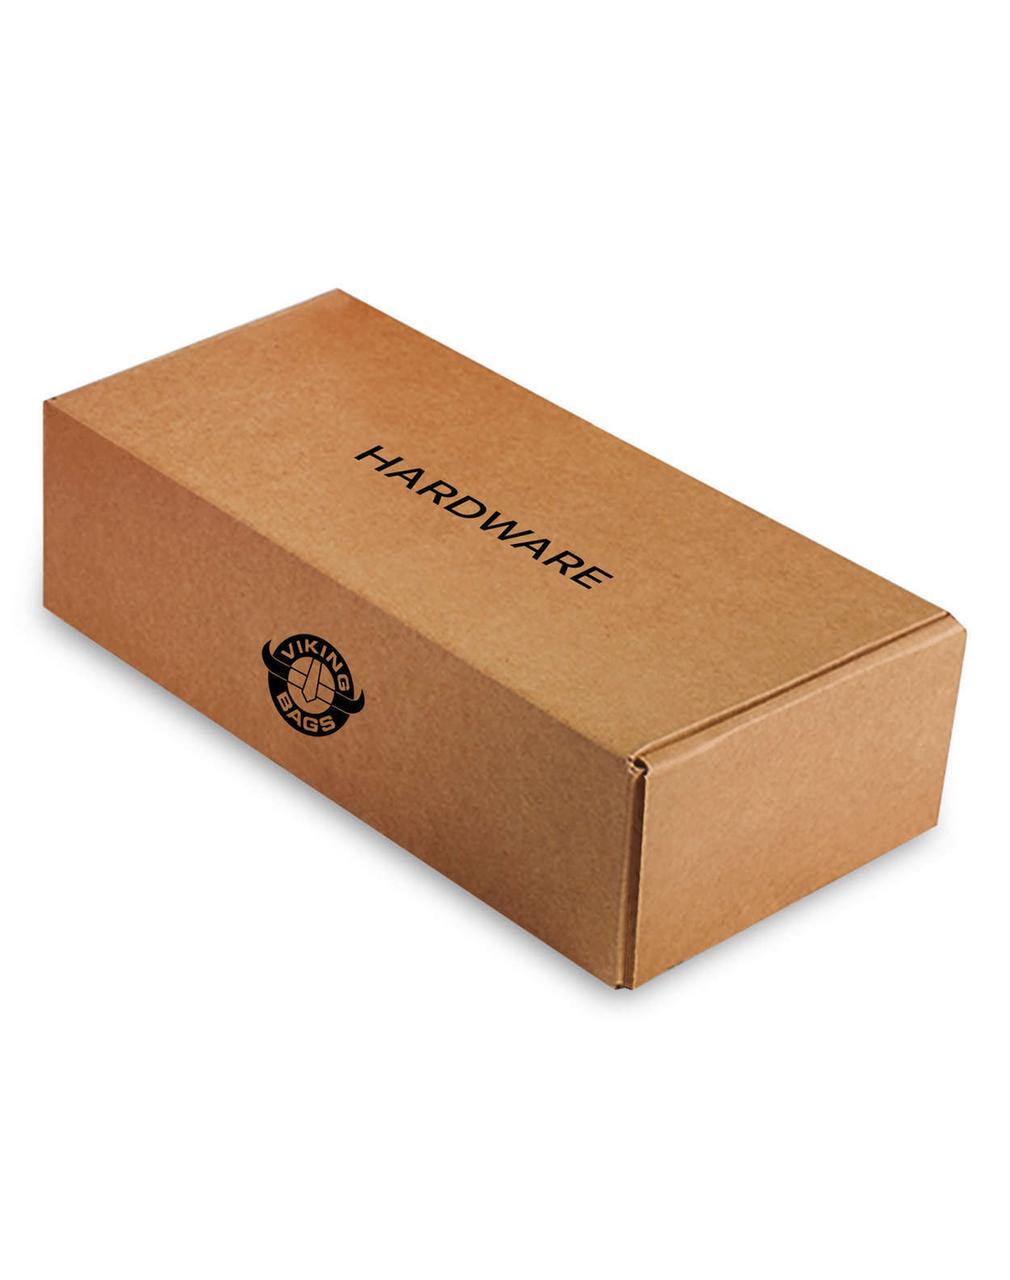 Honda 750 Shadow Phantom Slanted Studded Motorcycle Saddlebags box